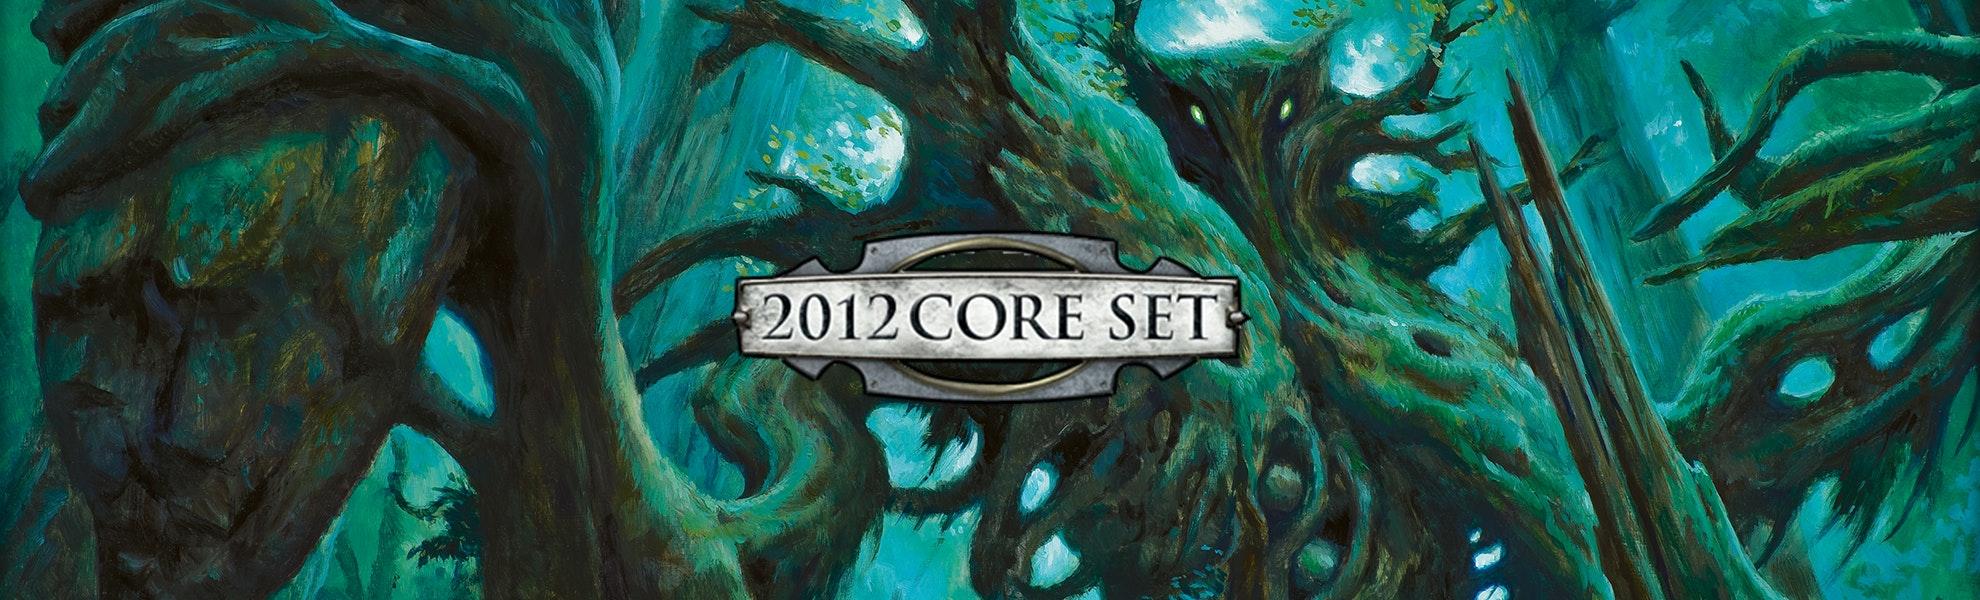 Magic 2012 Core Set Booster Box